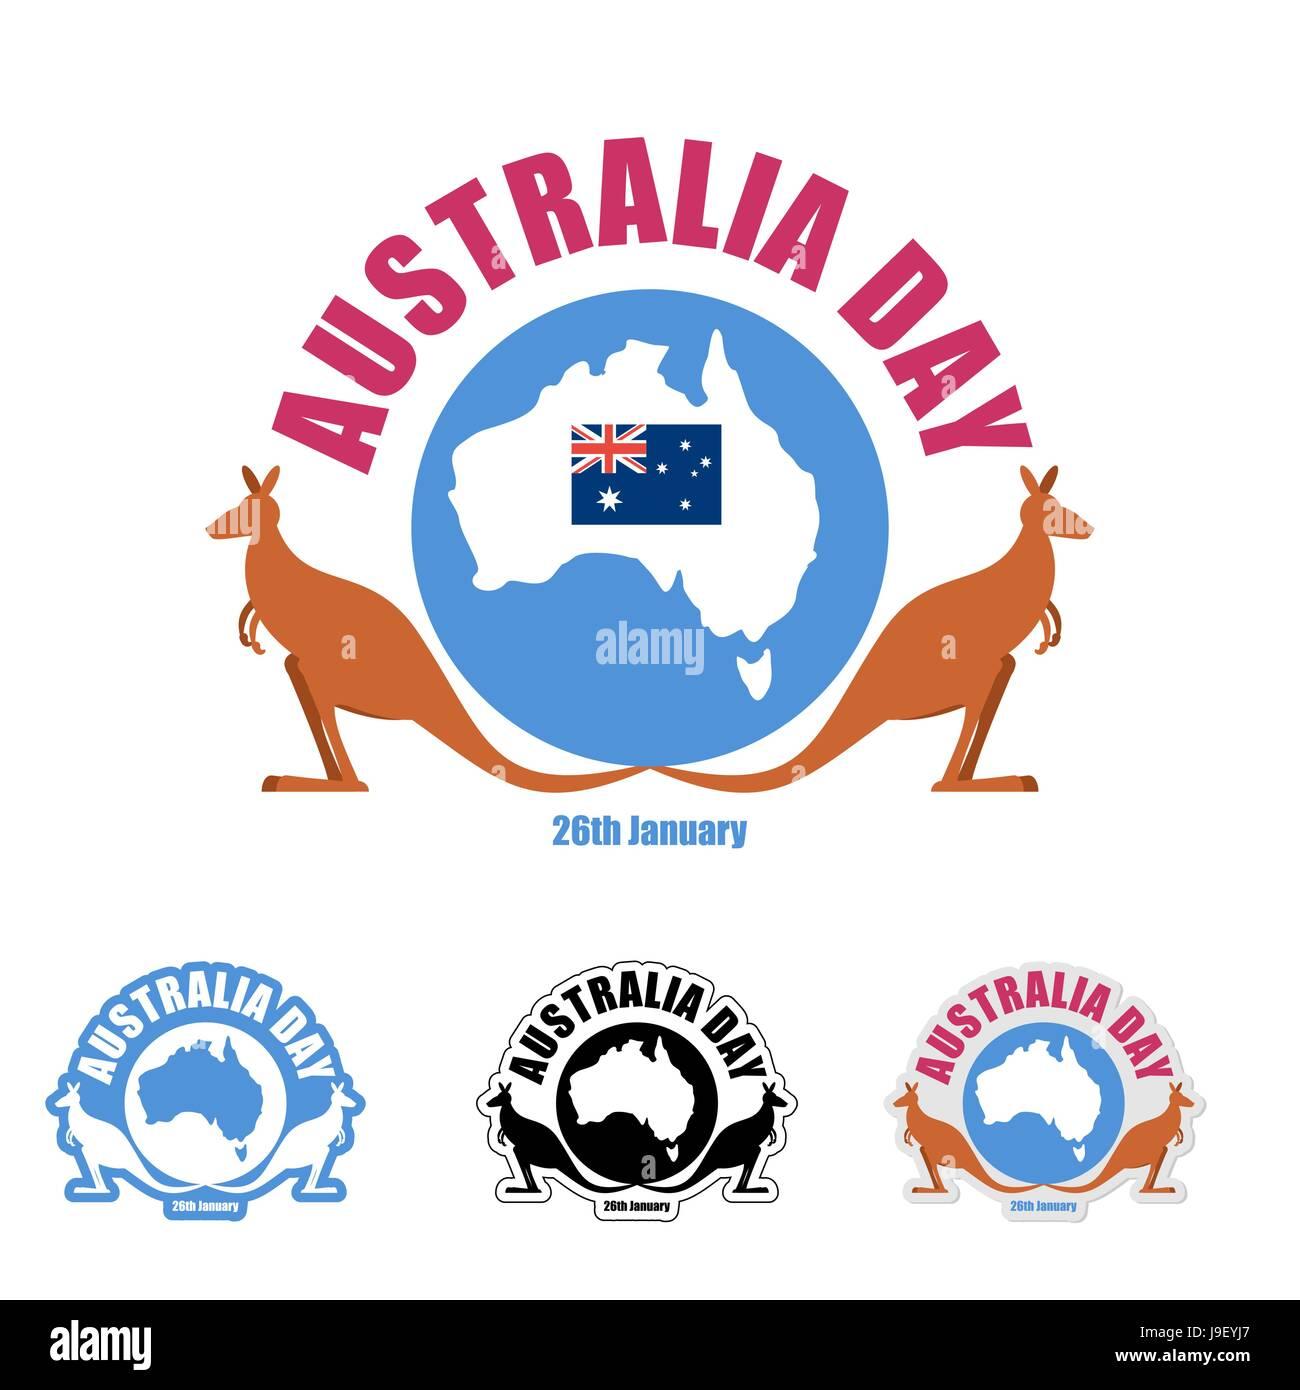 Map Of Australia Logo.Australia Day Logo For Holiday Kangaroo And Map Of Australia